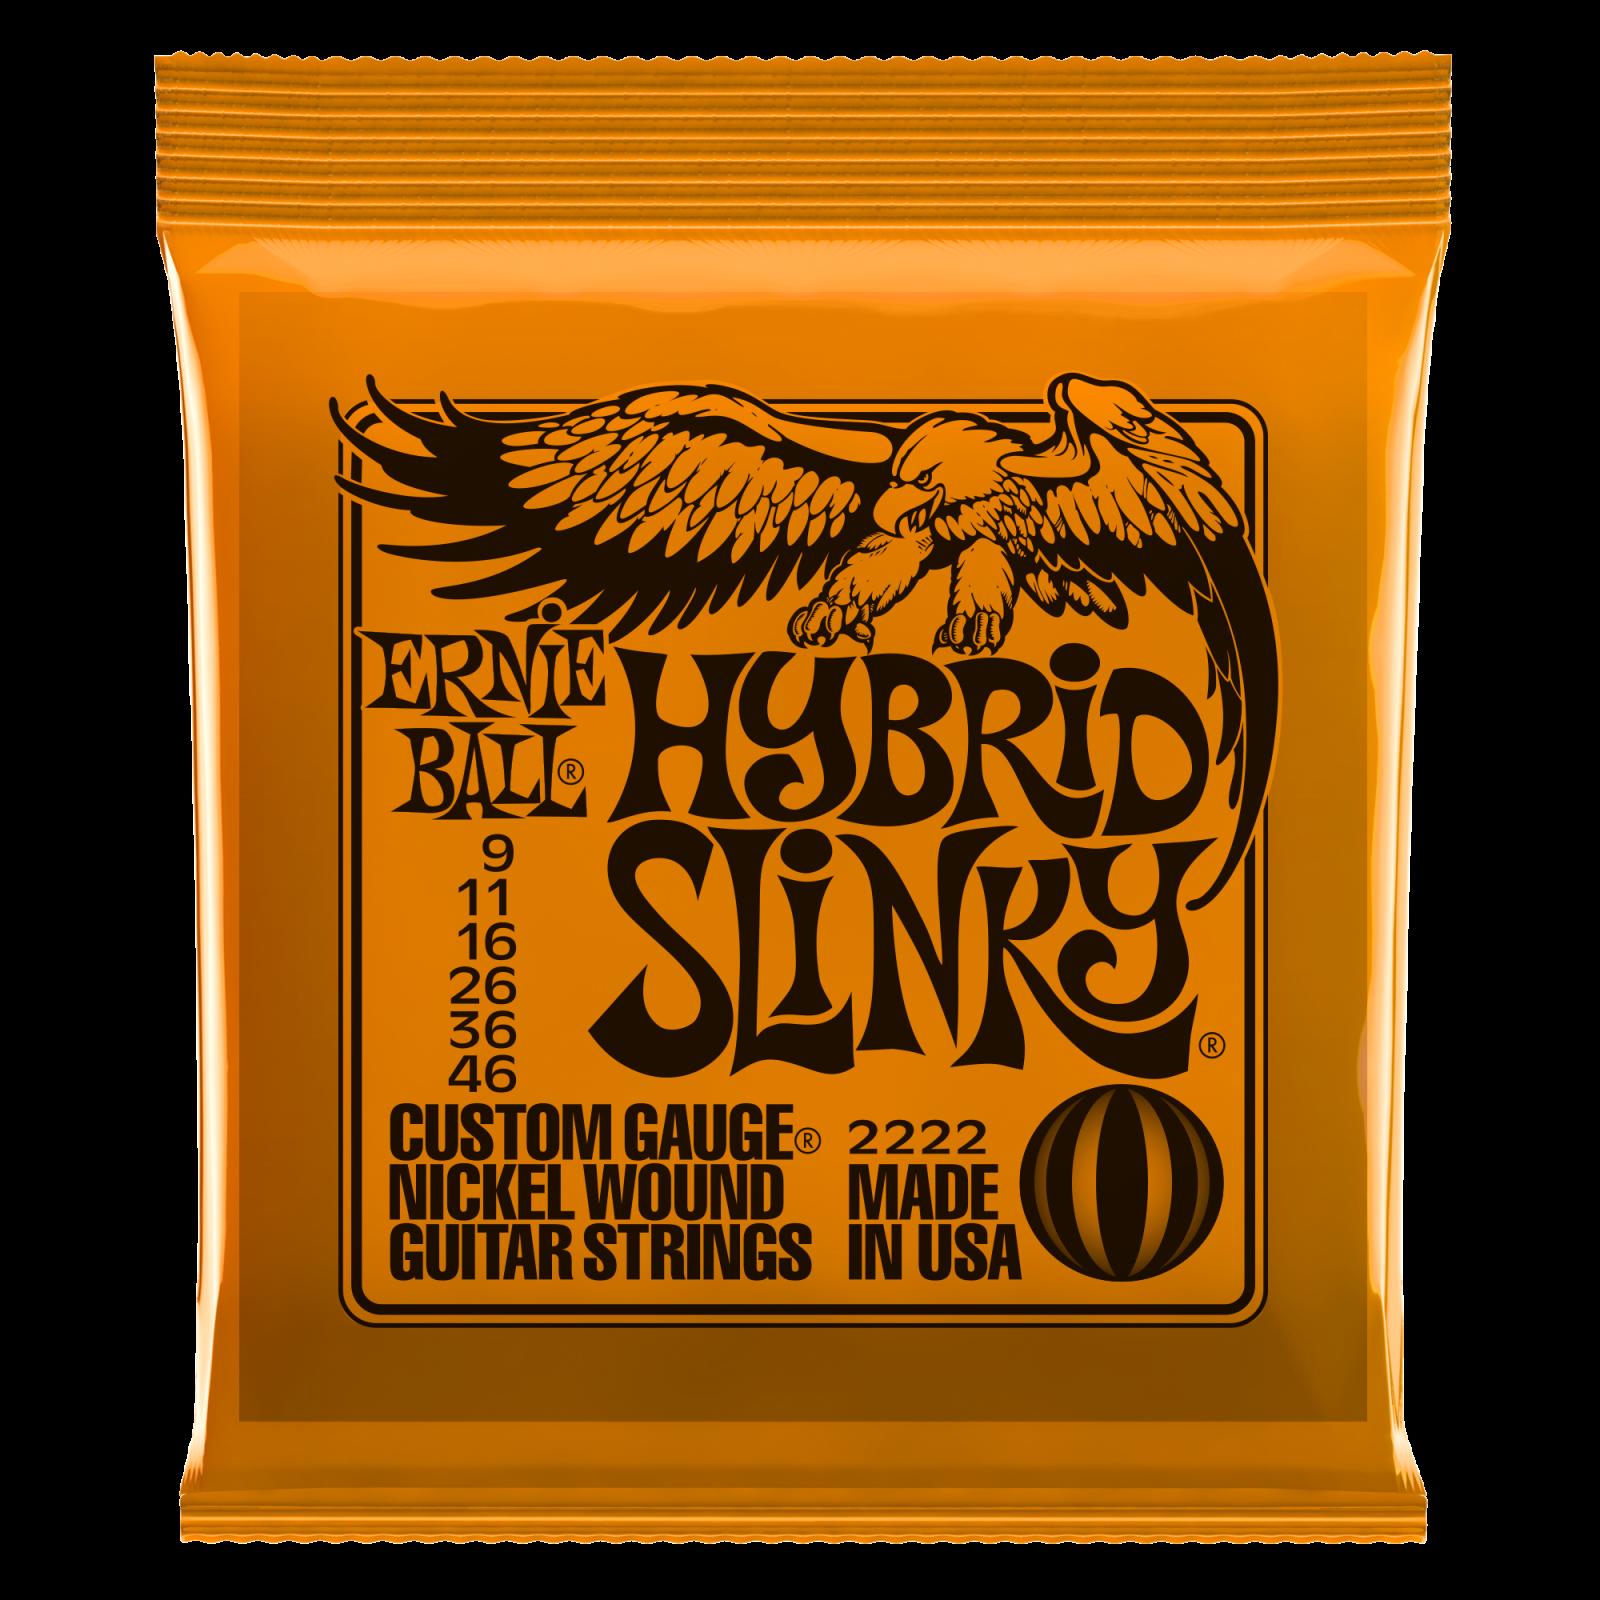 Ernie Ball Hybrid Slinky 2222 Electric Guitar Strings, Nickel Wound, 9-46